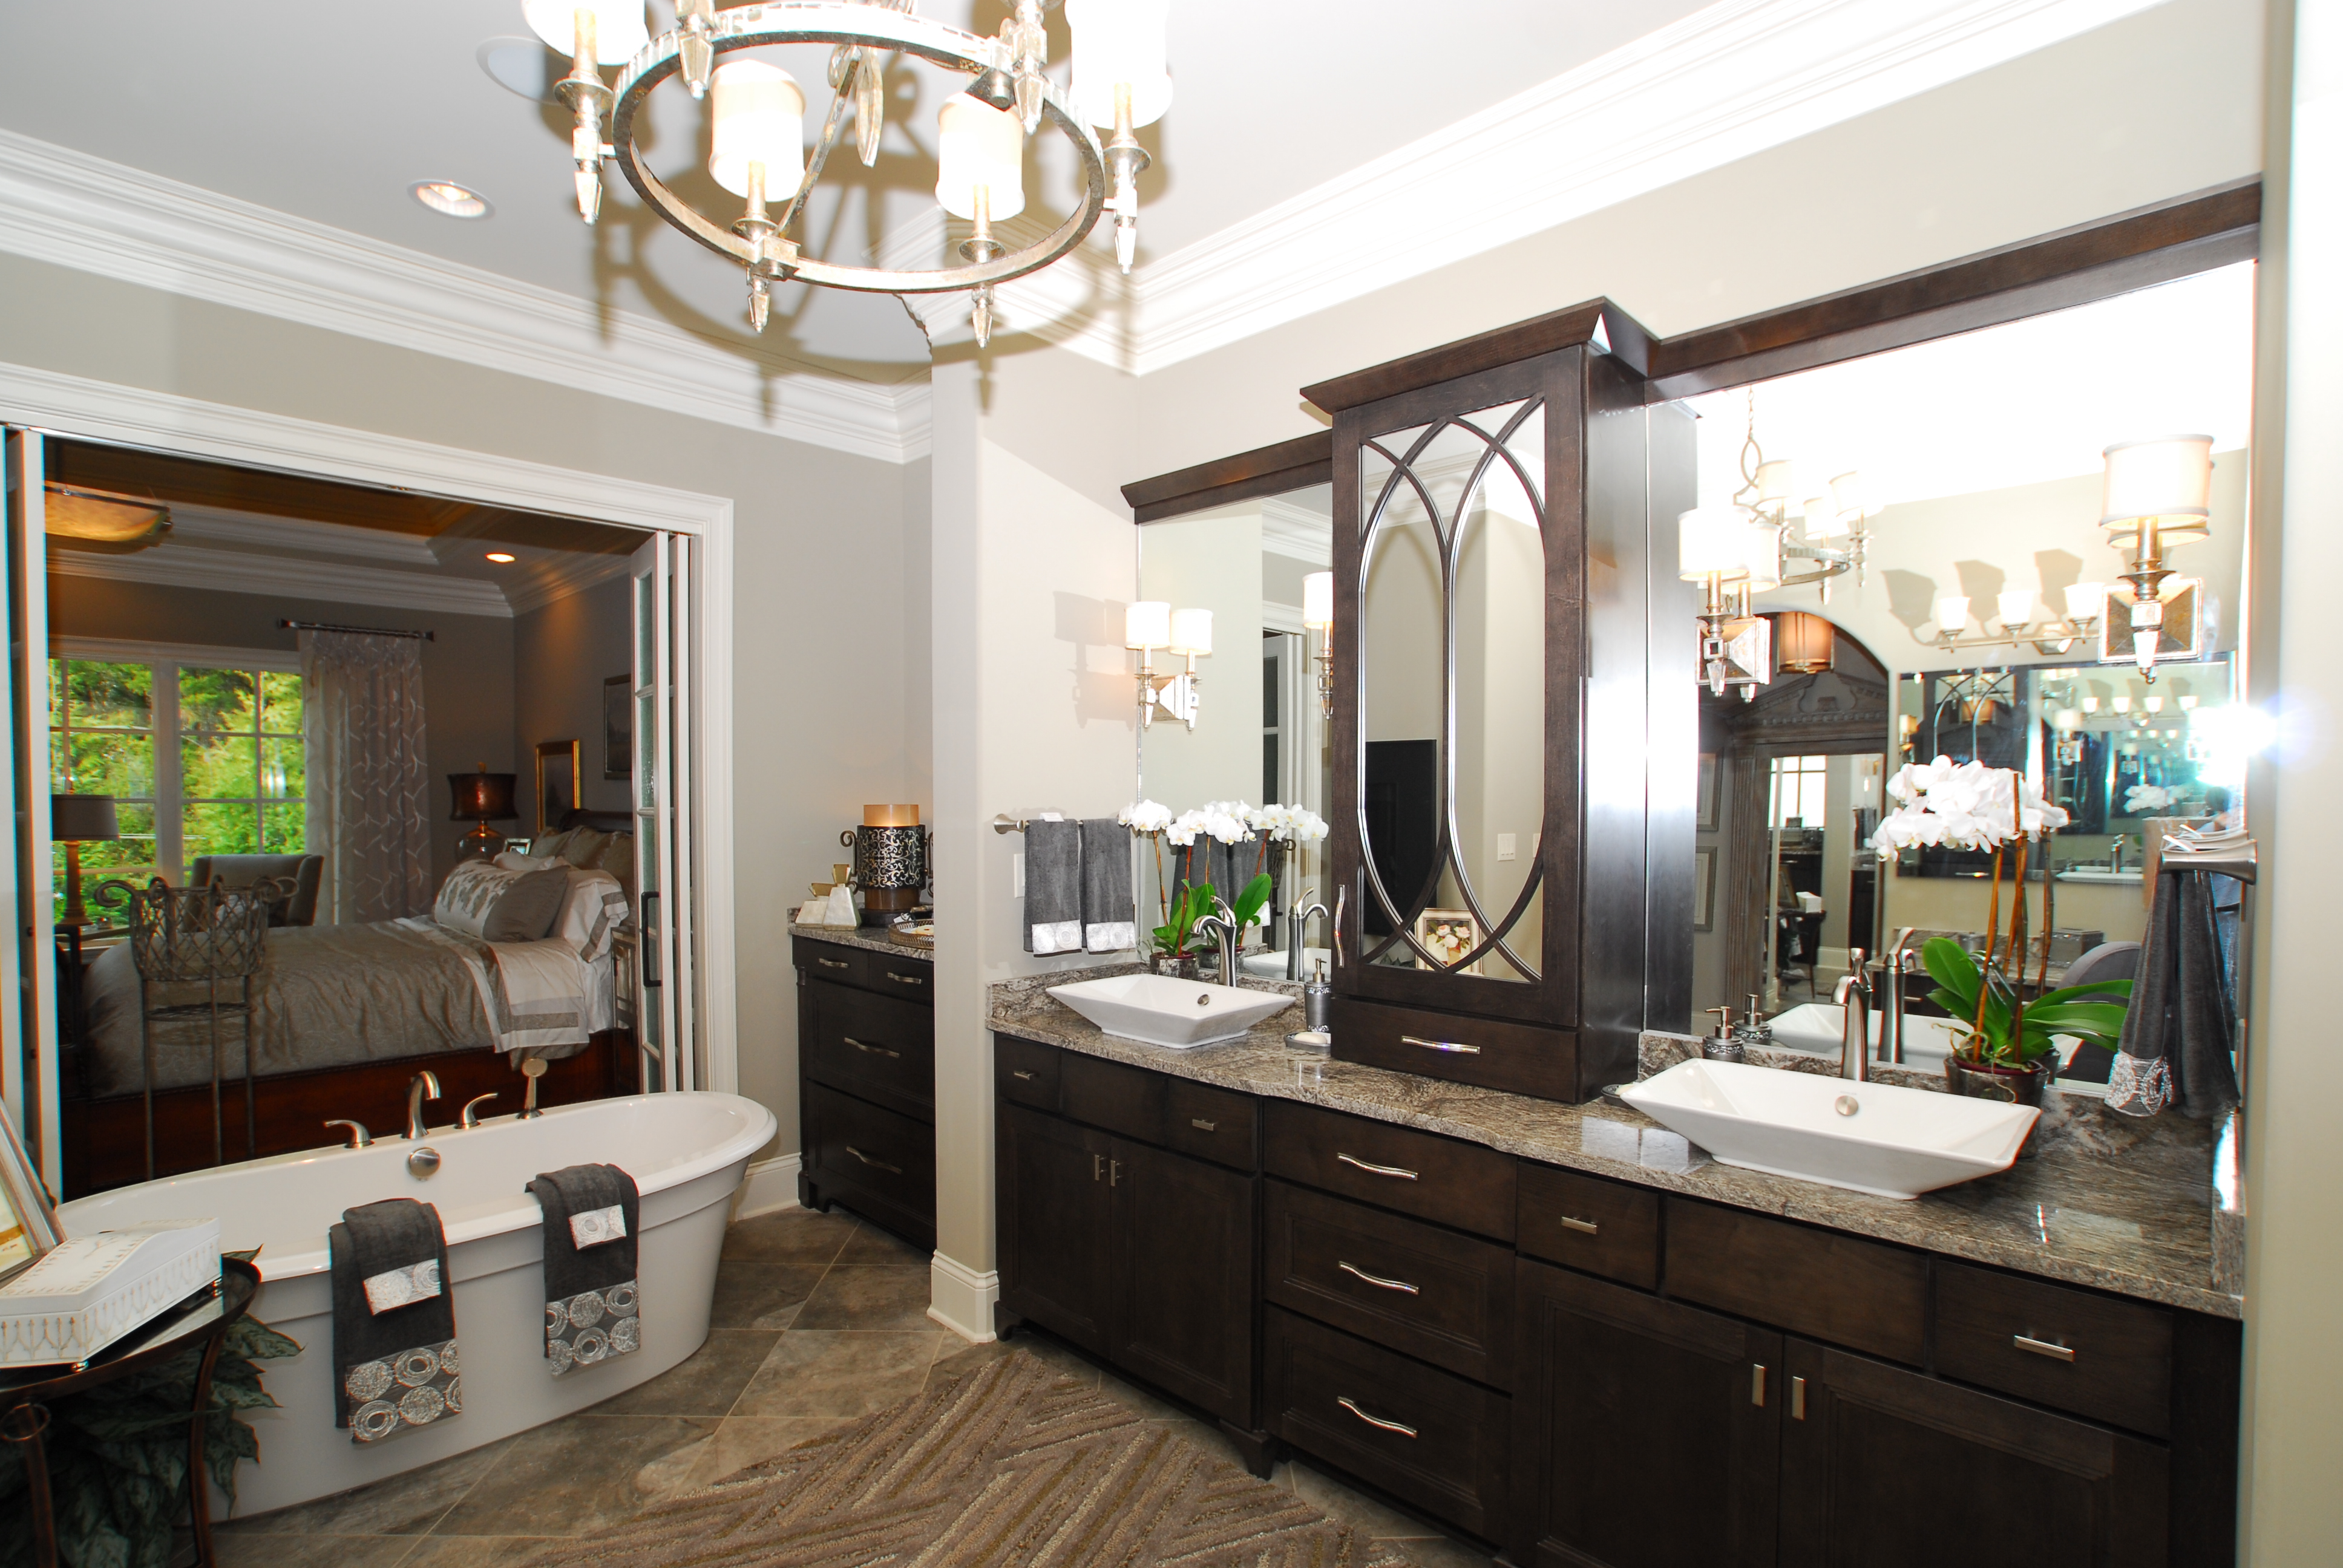 Bathroom Cabinets Knoxville Tn bathroom gallery | standard kitchen & bath | knoxville bathroom